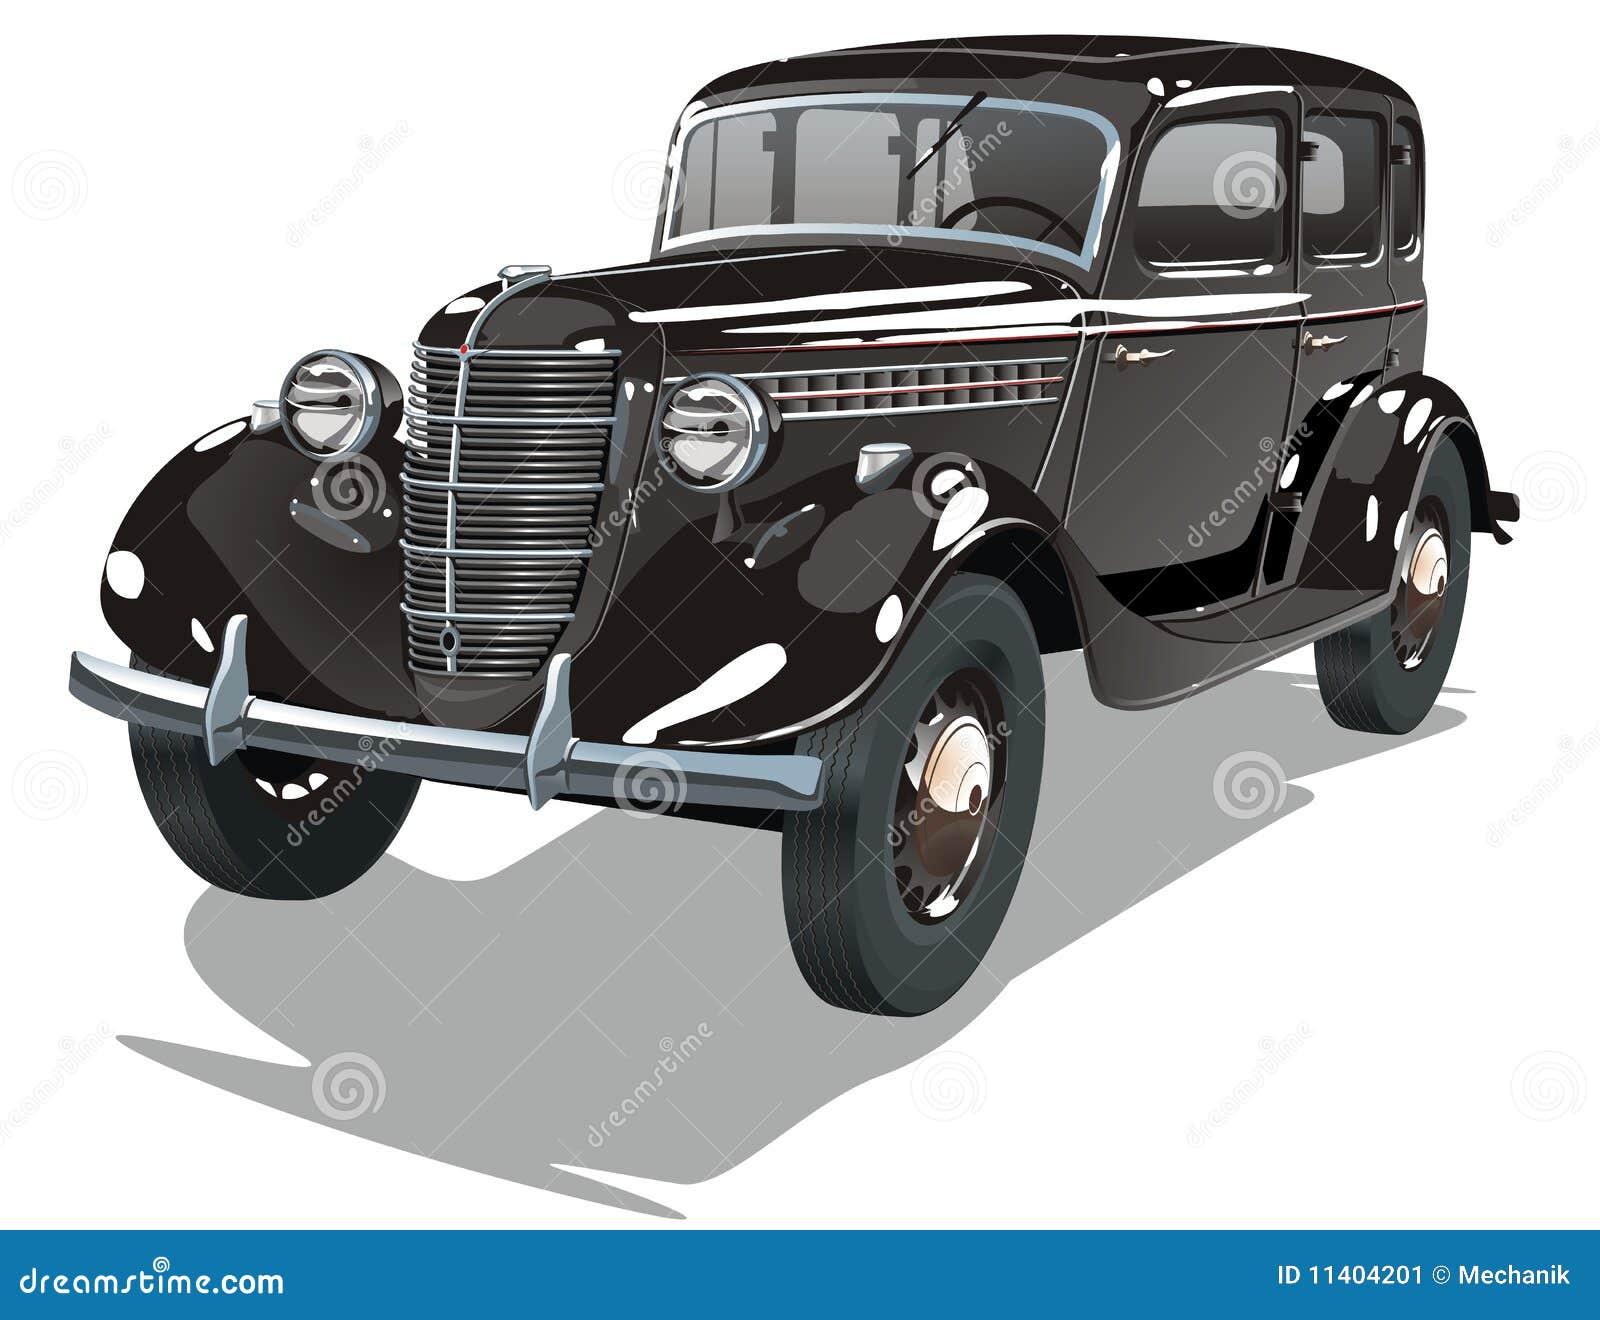 Vector Black Vintage Car Stock Image - Image: 11404201